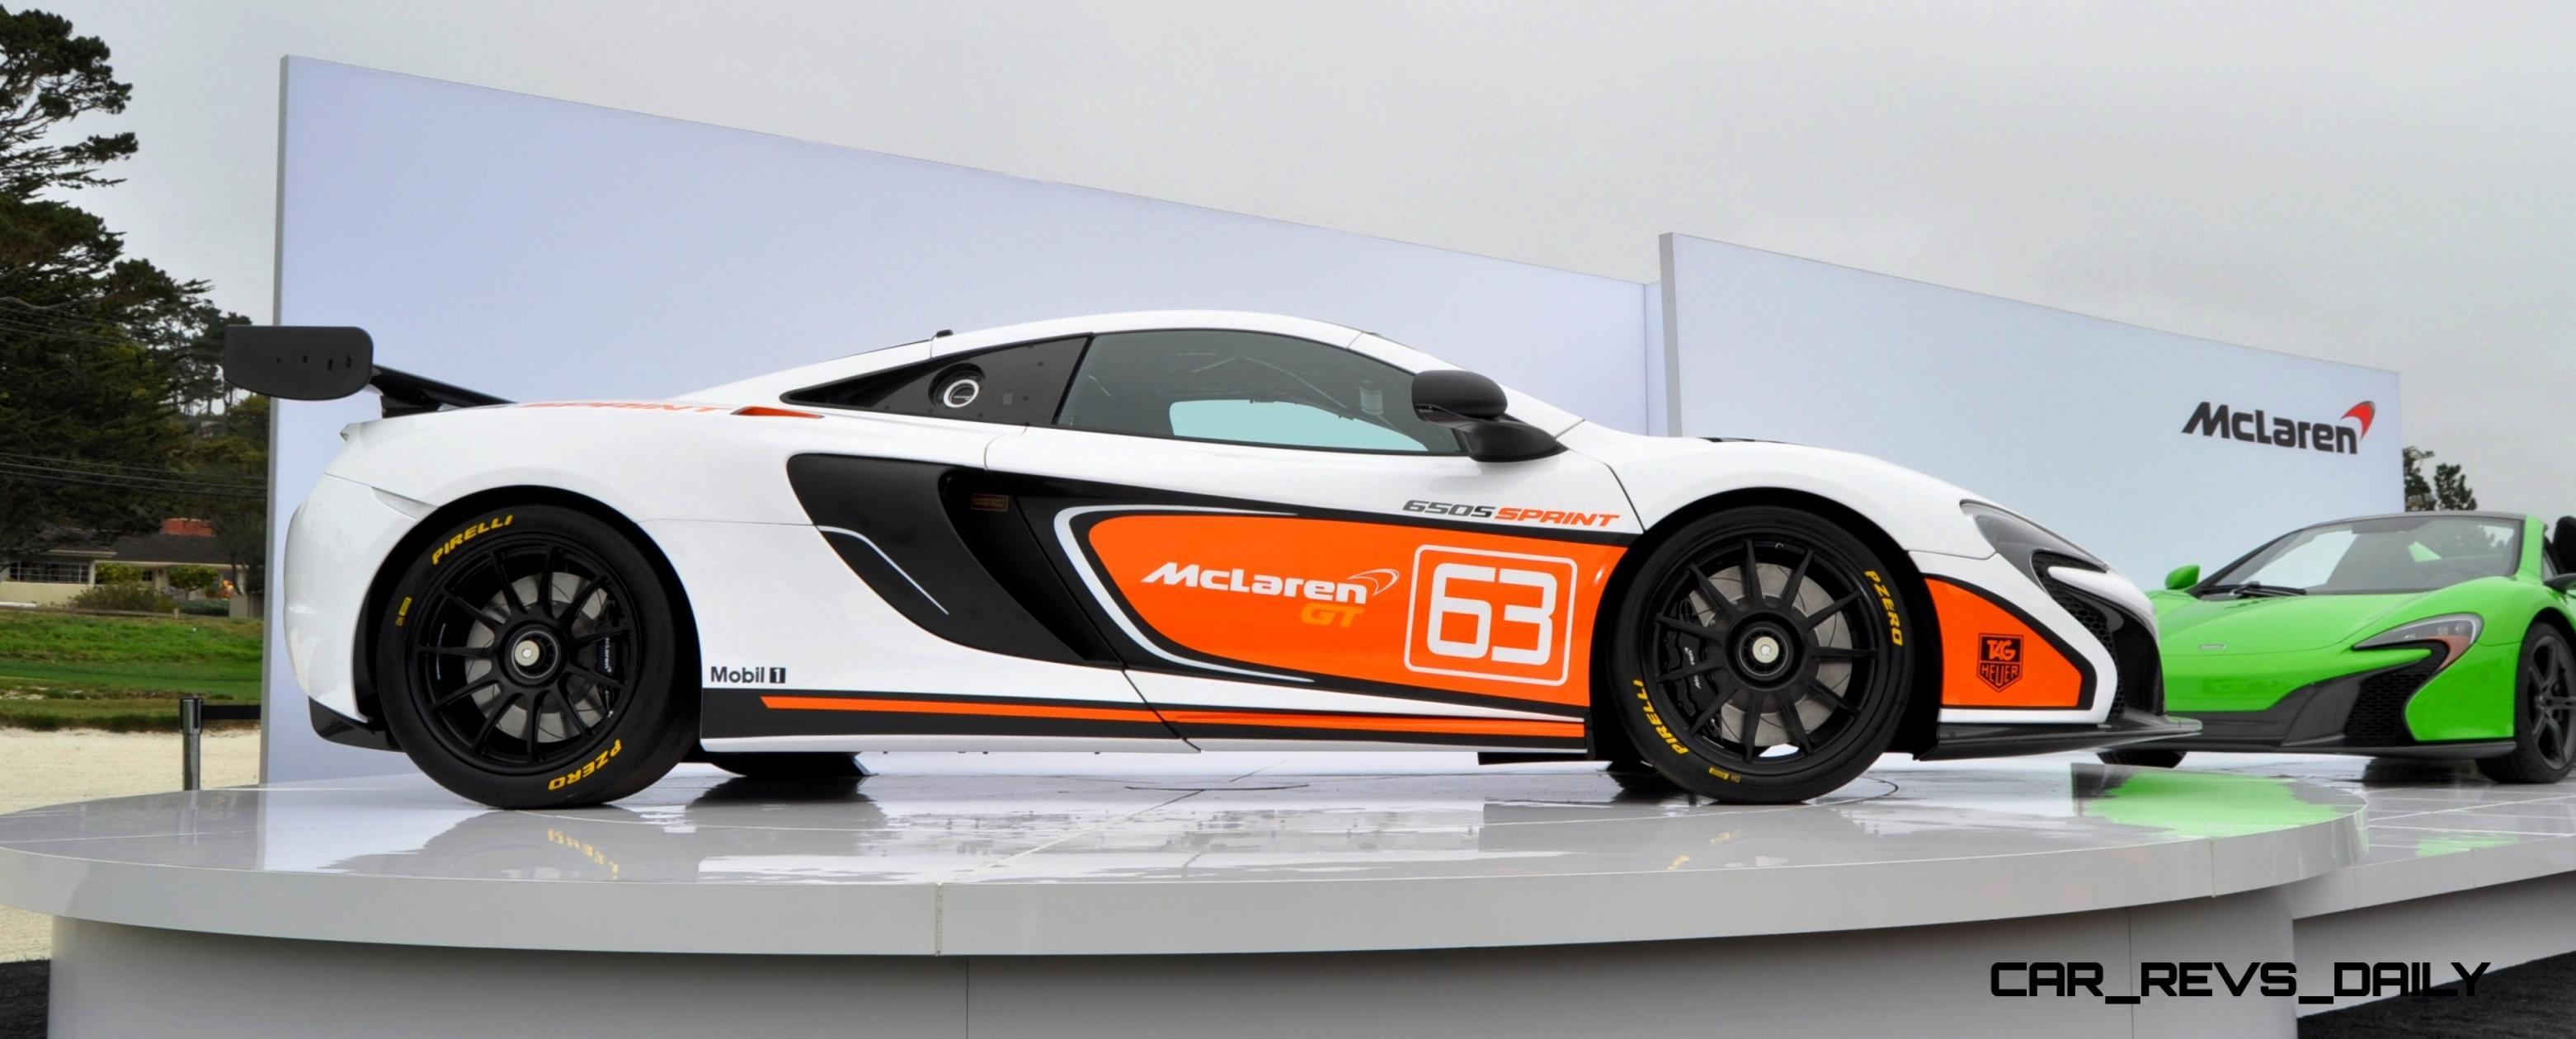 Updated With 78 Pebble Beach Debut Photos - 2015 McLaren 650S Sprint